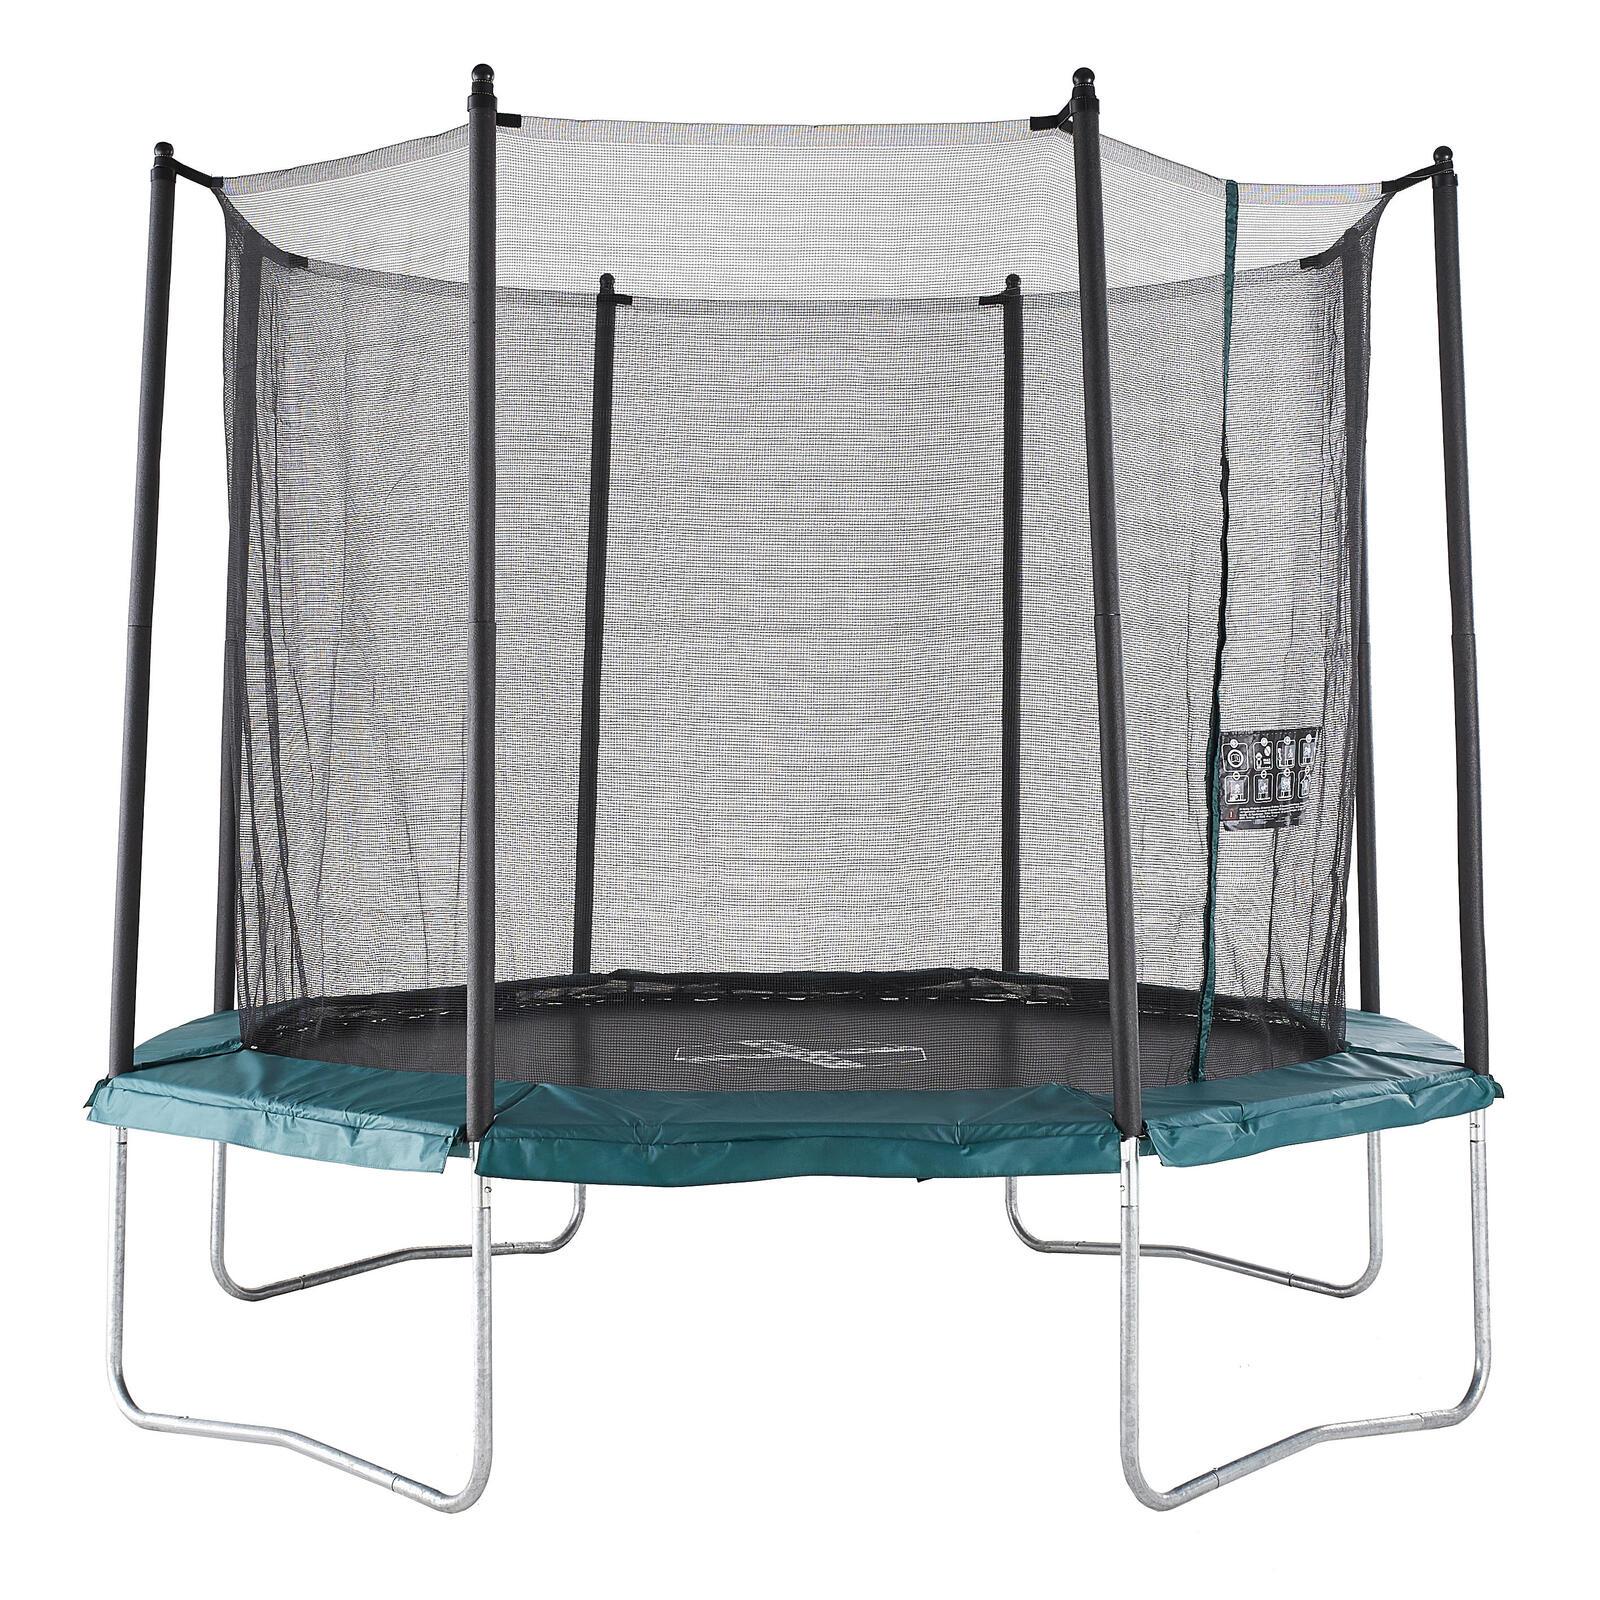 Octagonal trampoline 300